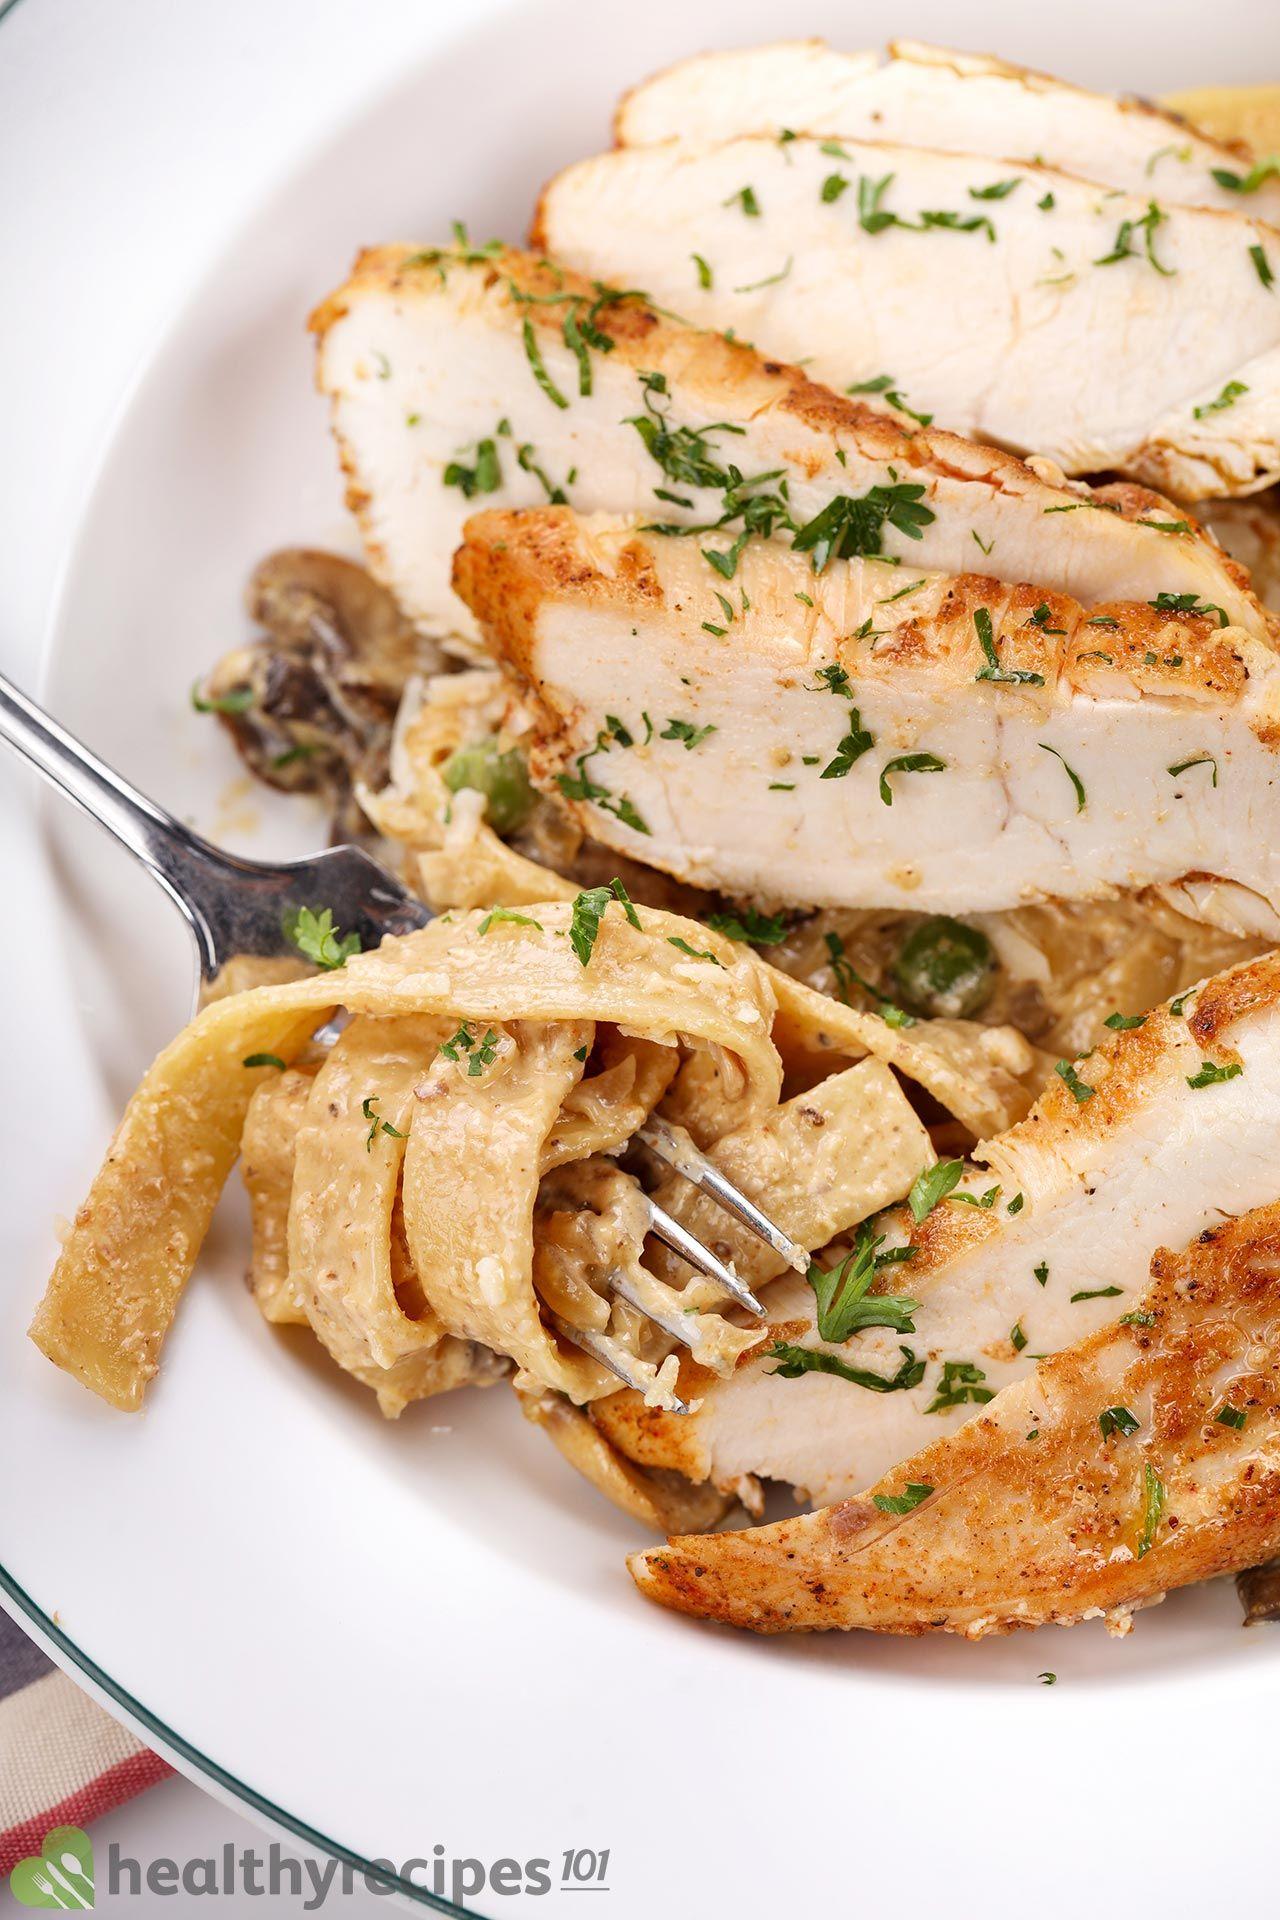 seasoning chicken for this recipe